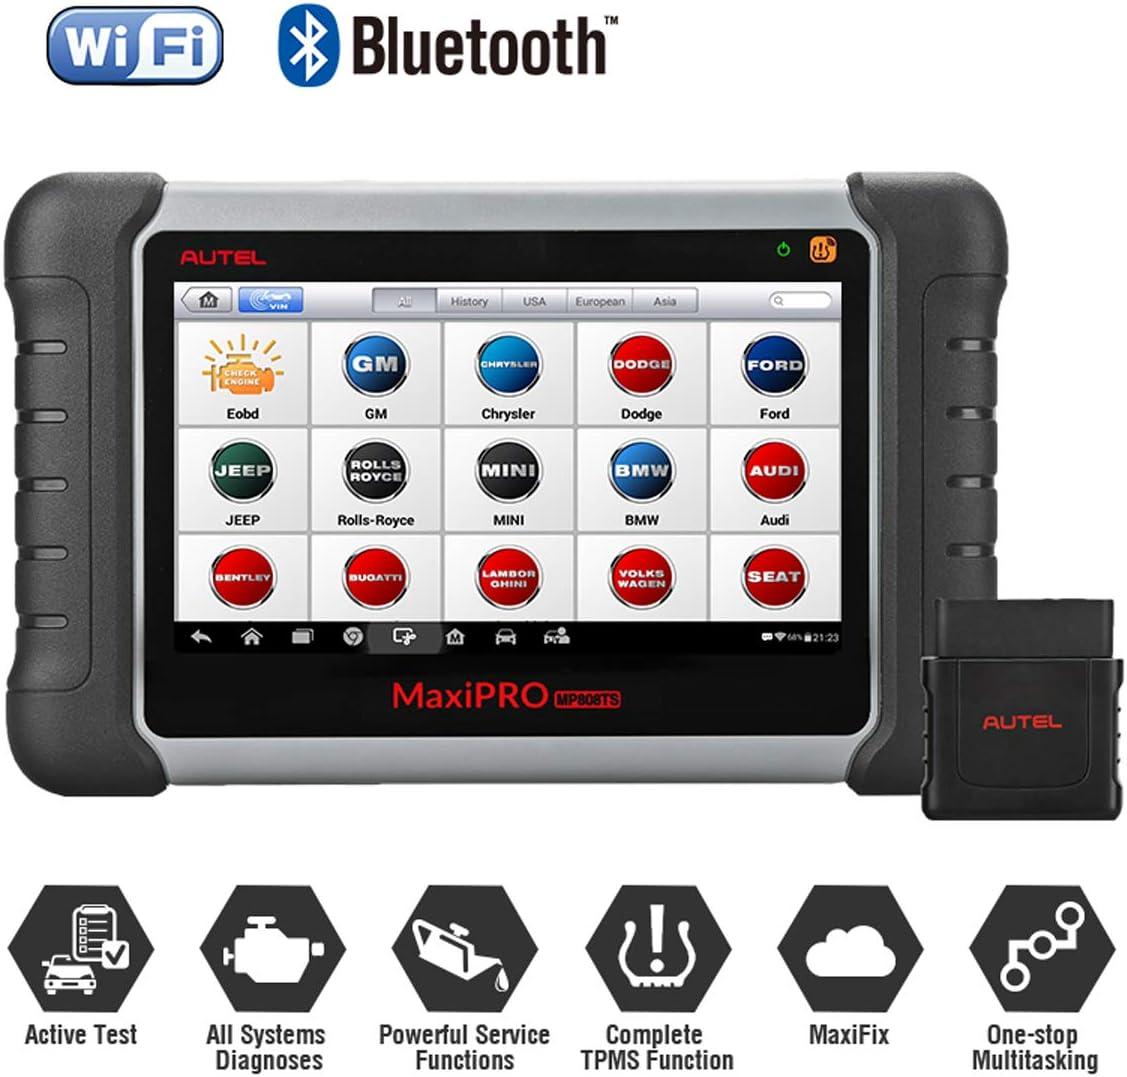 Autel Maxipro Mp808ts Diagnosegerät Für Fahrzeuge Mit Tpms Funktion Und Bluetooth Auto